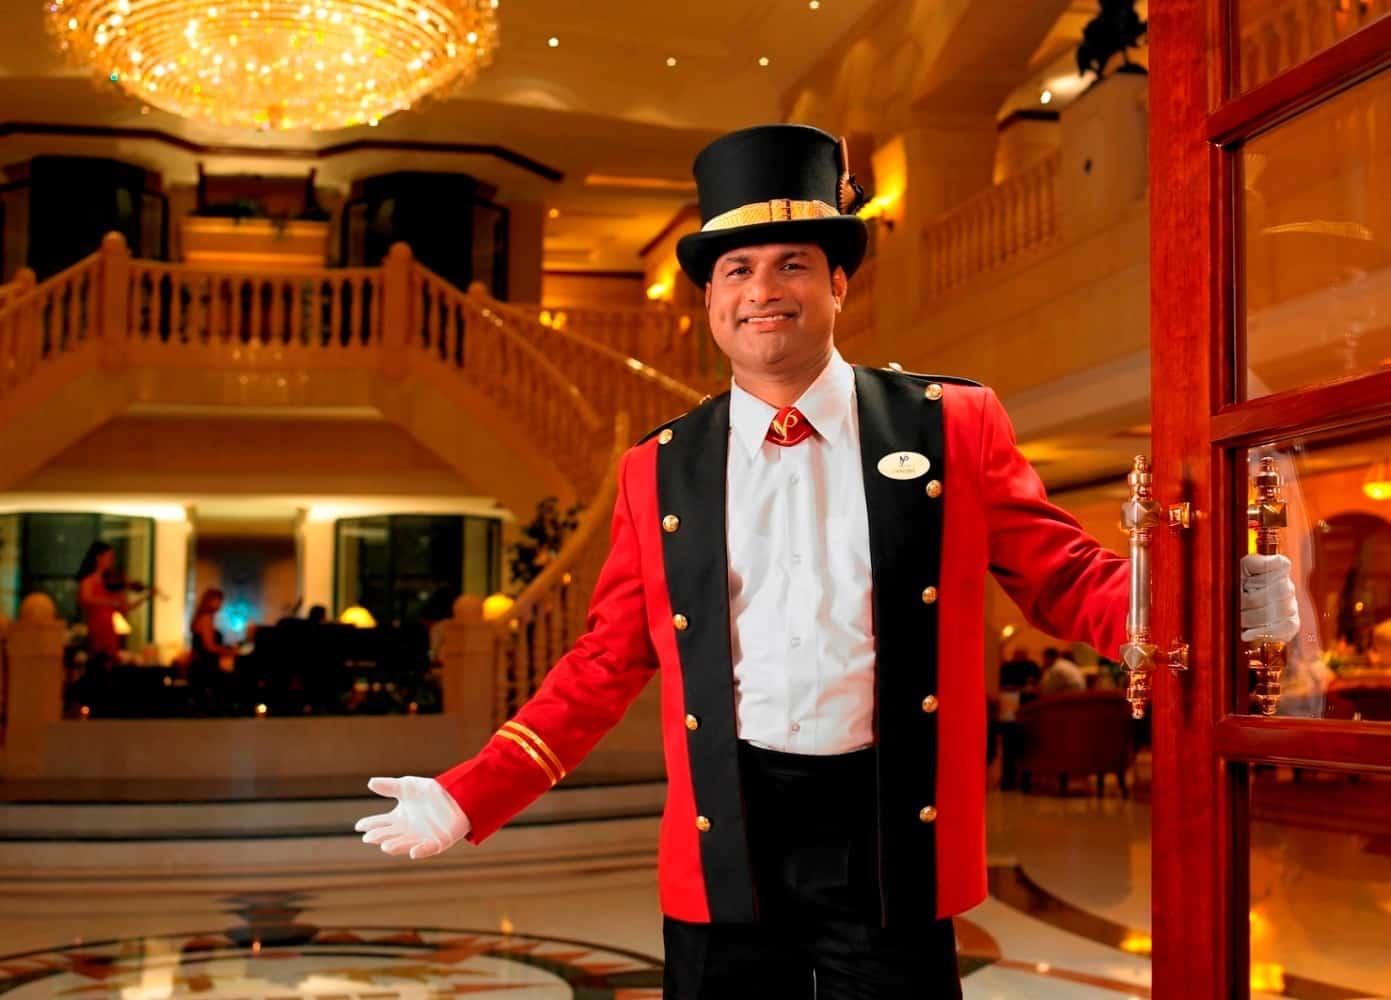 Hotel-doorman-1